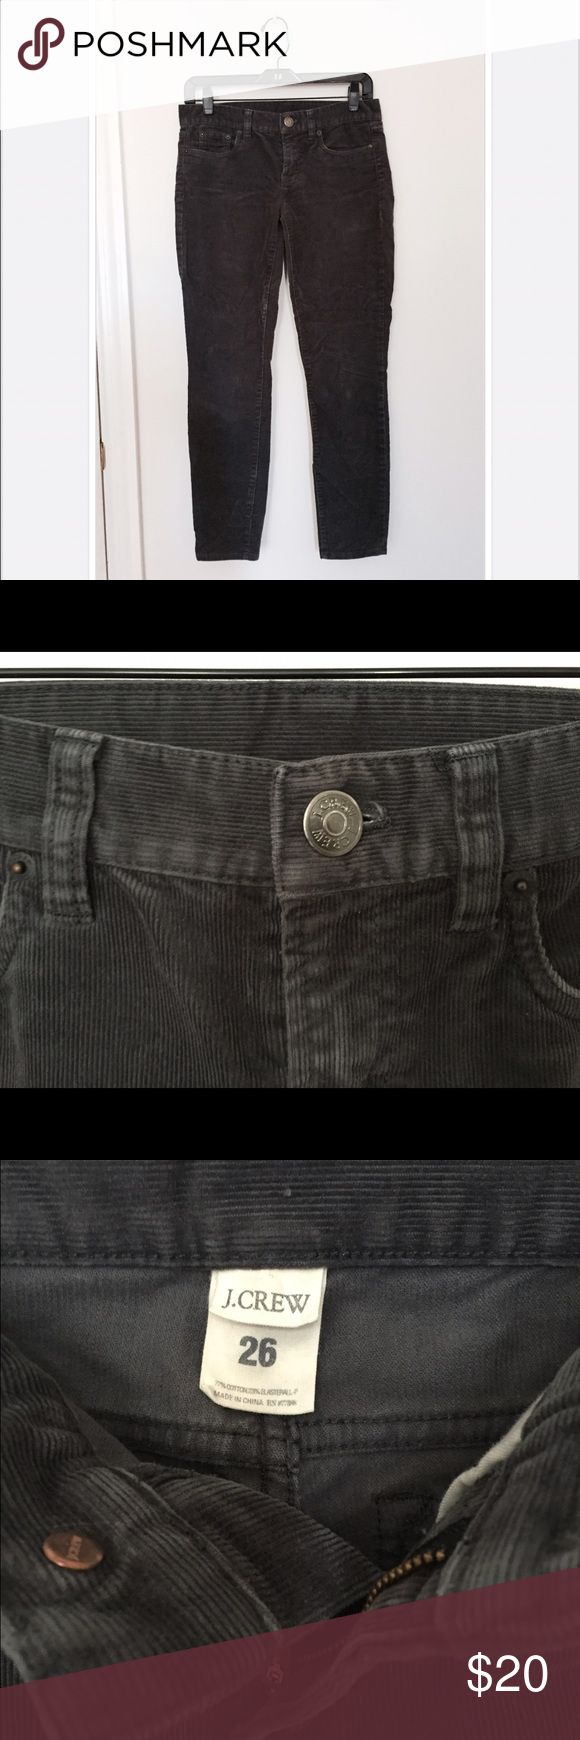 J Crew Women's Slim Cord Pants Size 26 J Crew slim fit women's cord pants size 26. These are a slightly distressed blue green gray tone. J. Crew Pants Ankle & Cropped